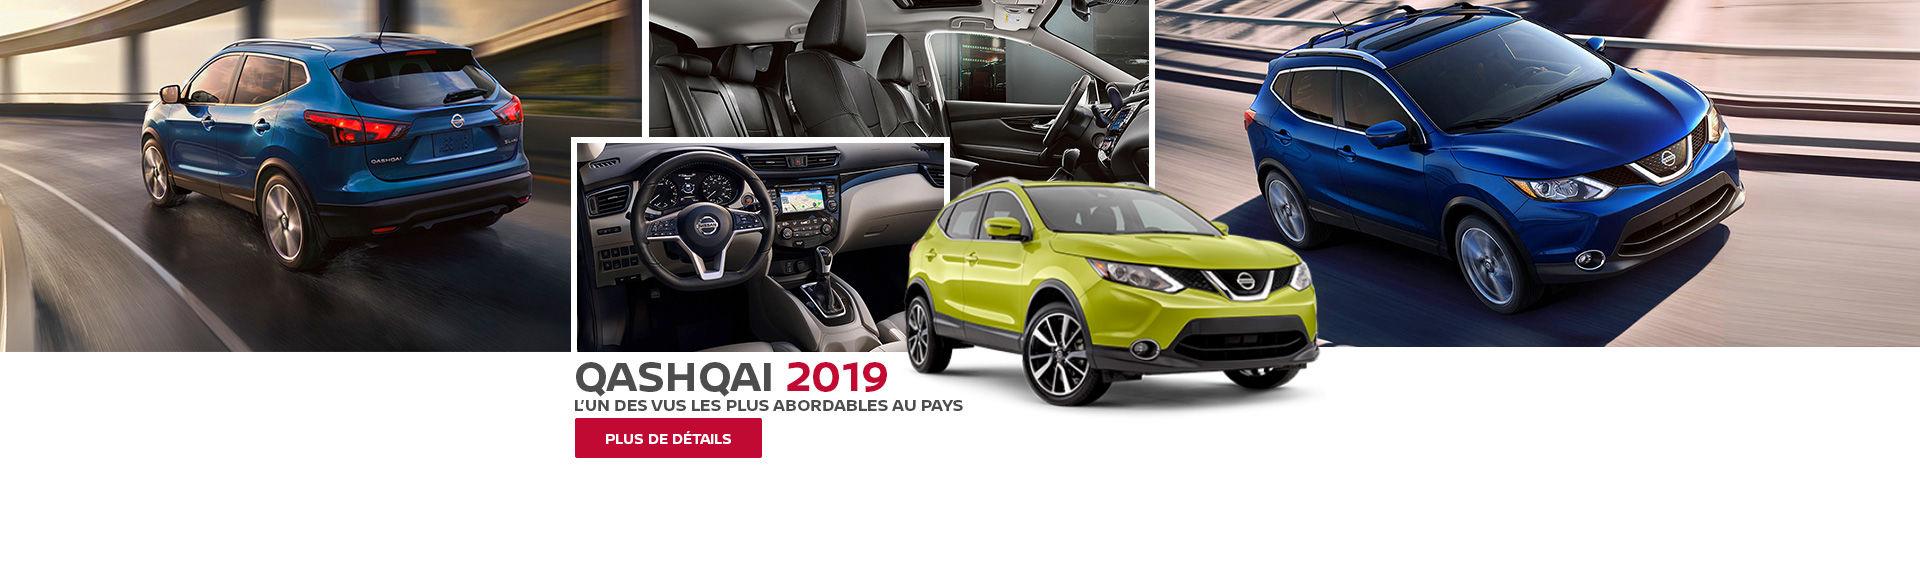 Qashqai 2019 Alma Nissan